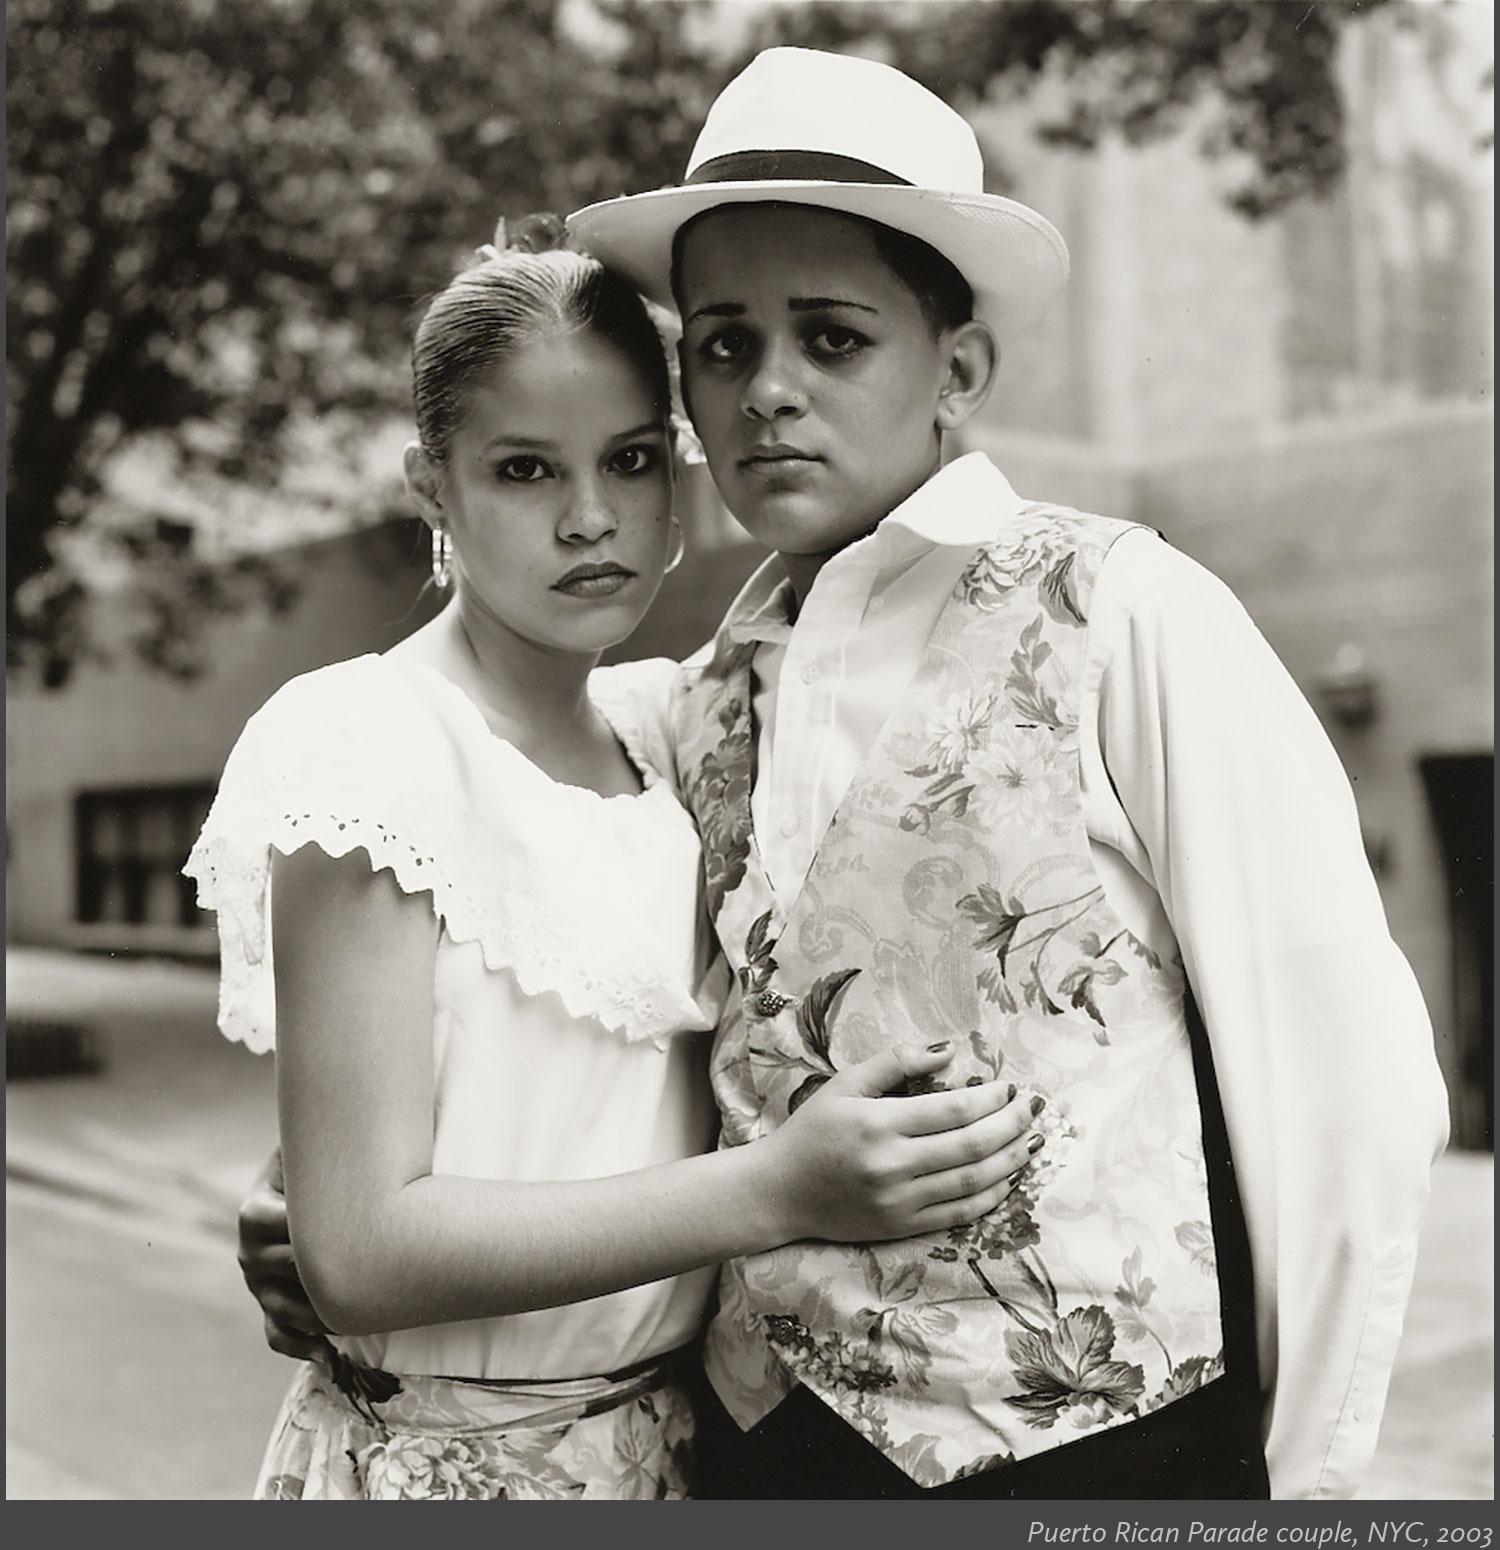 7_Puerto-Rican-Parade-Couple,-NYC,-2003.jpg